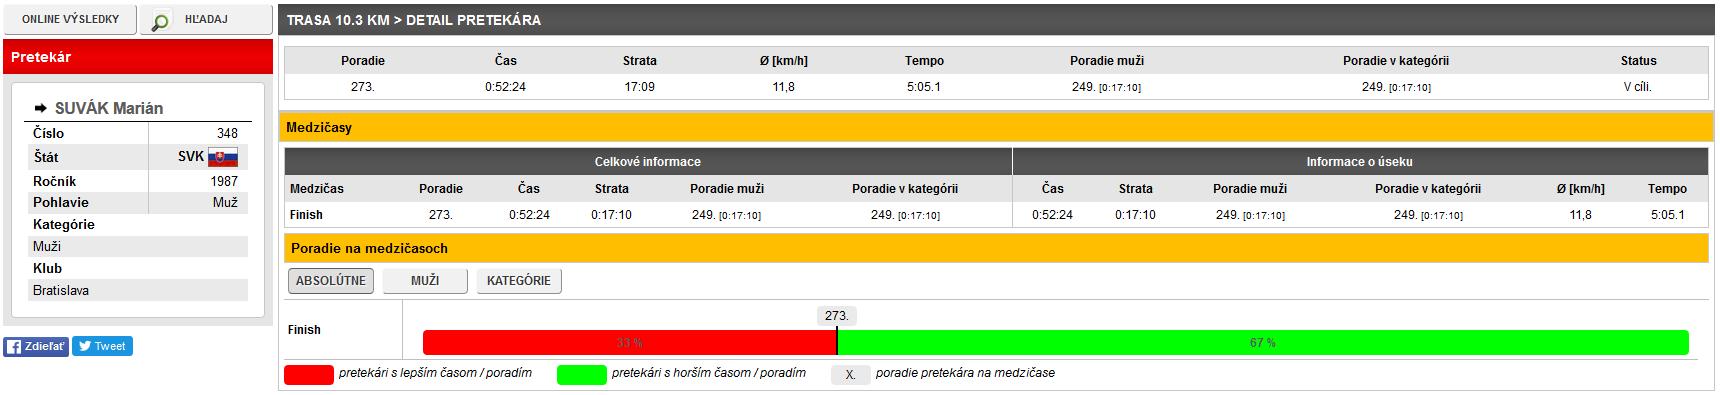 suvak-sk-2015-12-31_casomiera.png